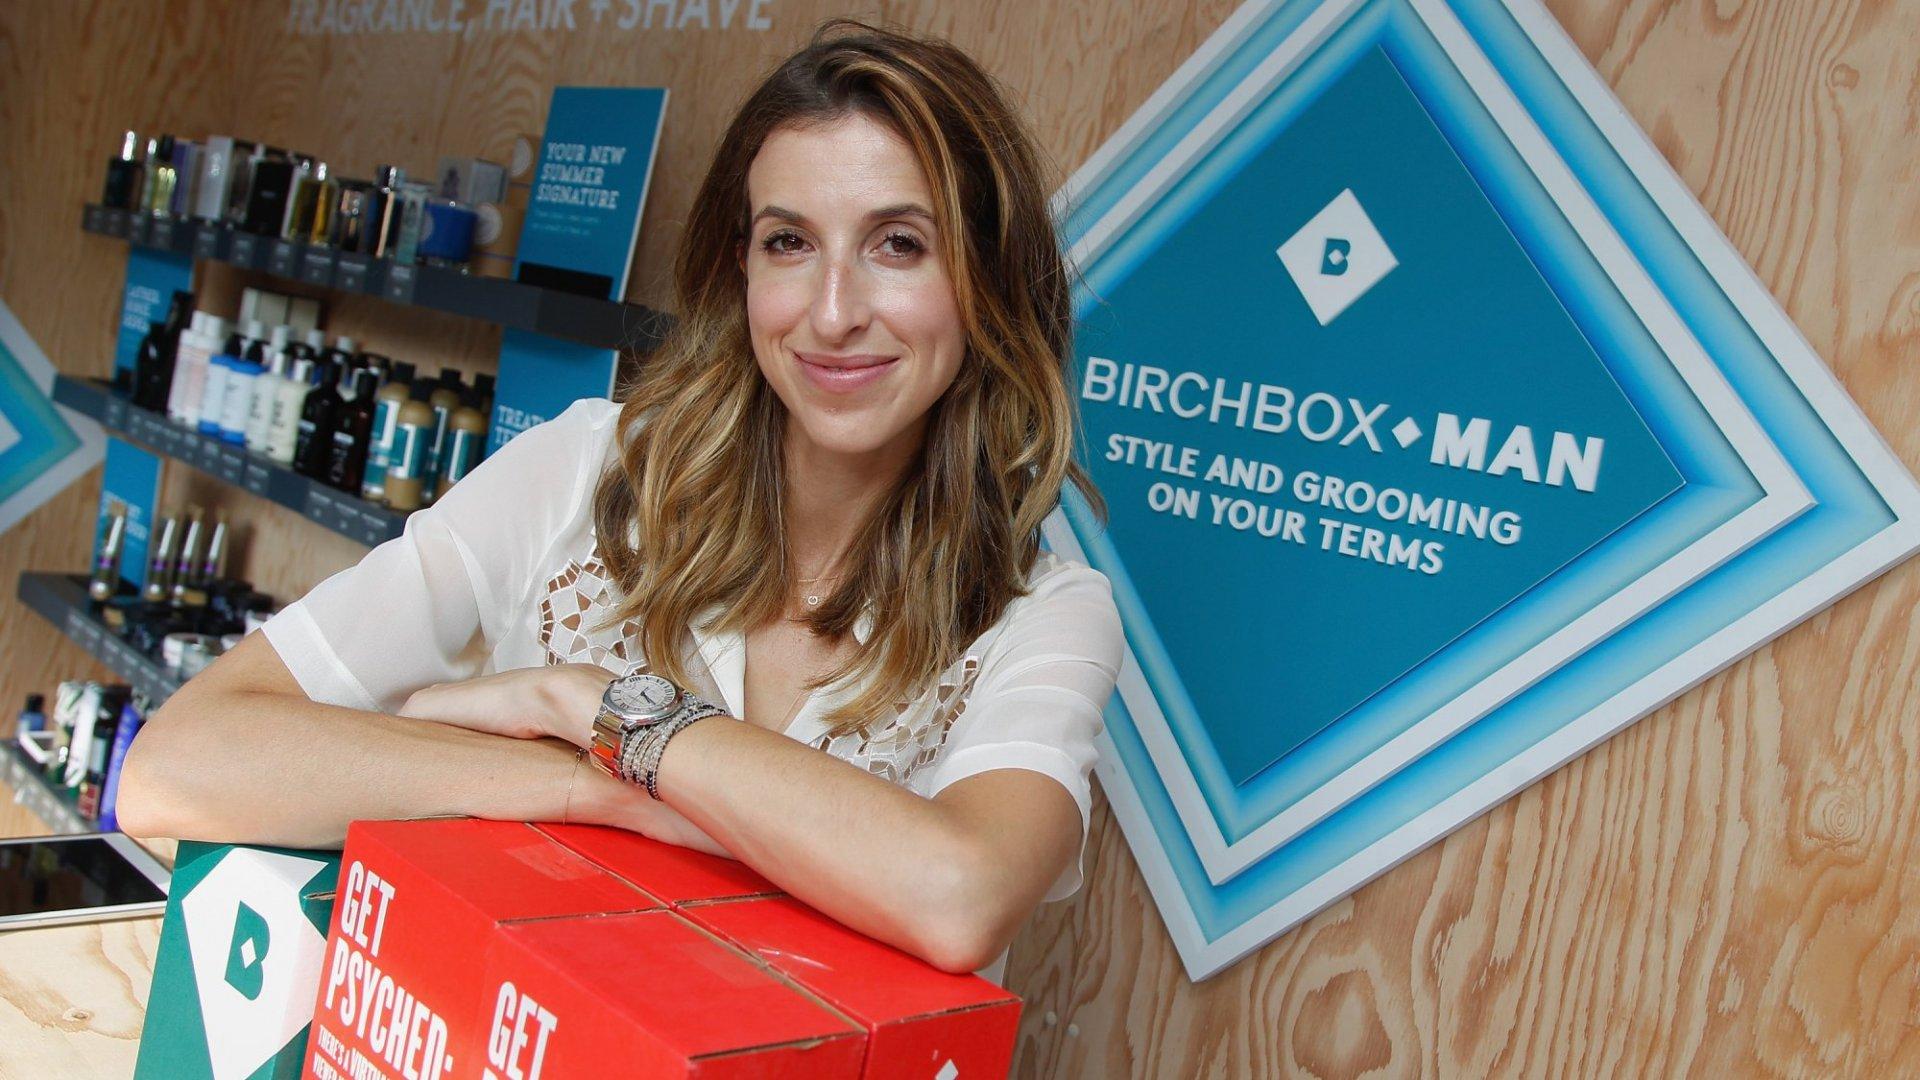 Birchbox Halts Expansion Plans in Effort to Become Profitable